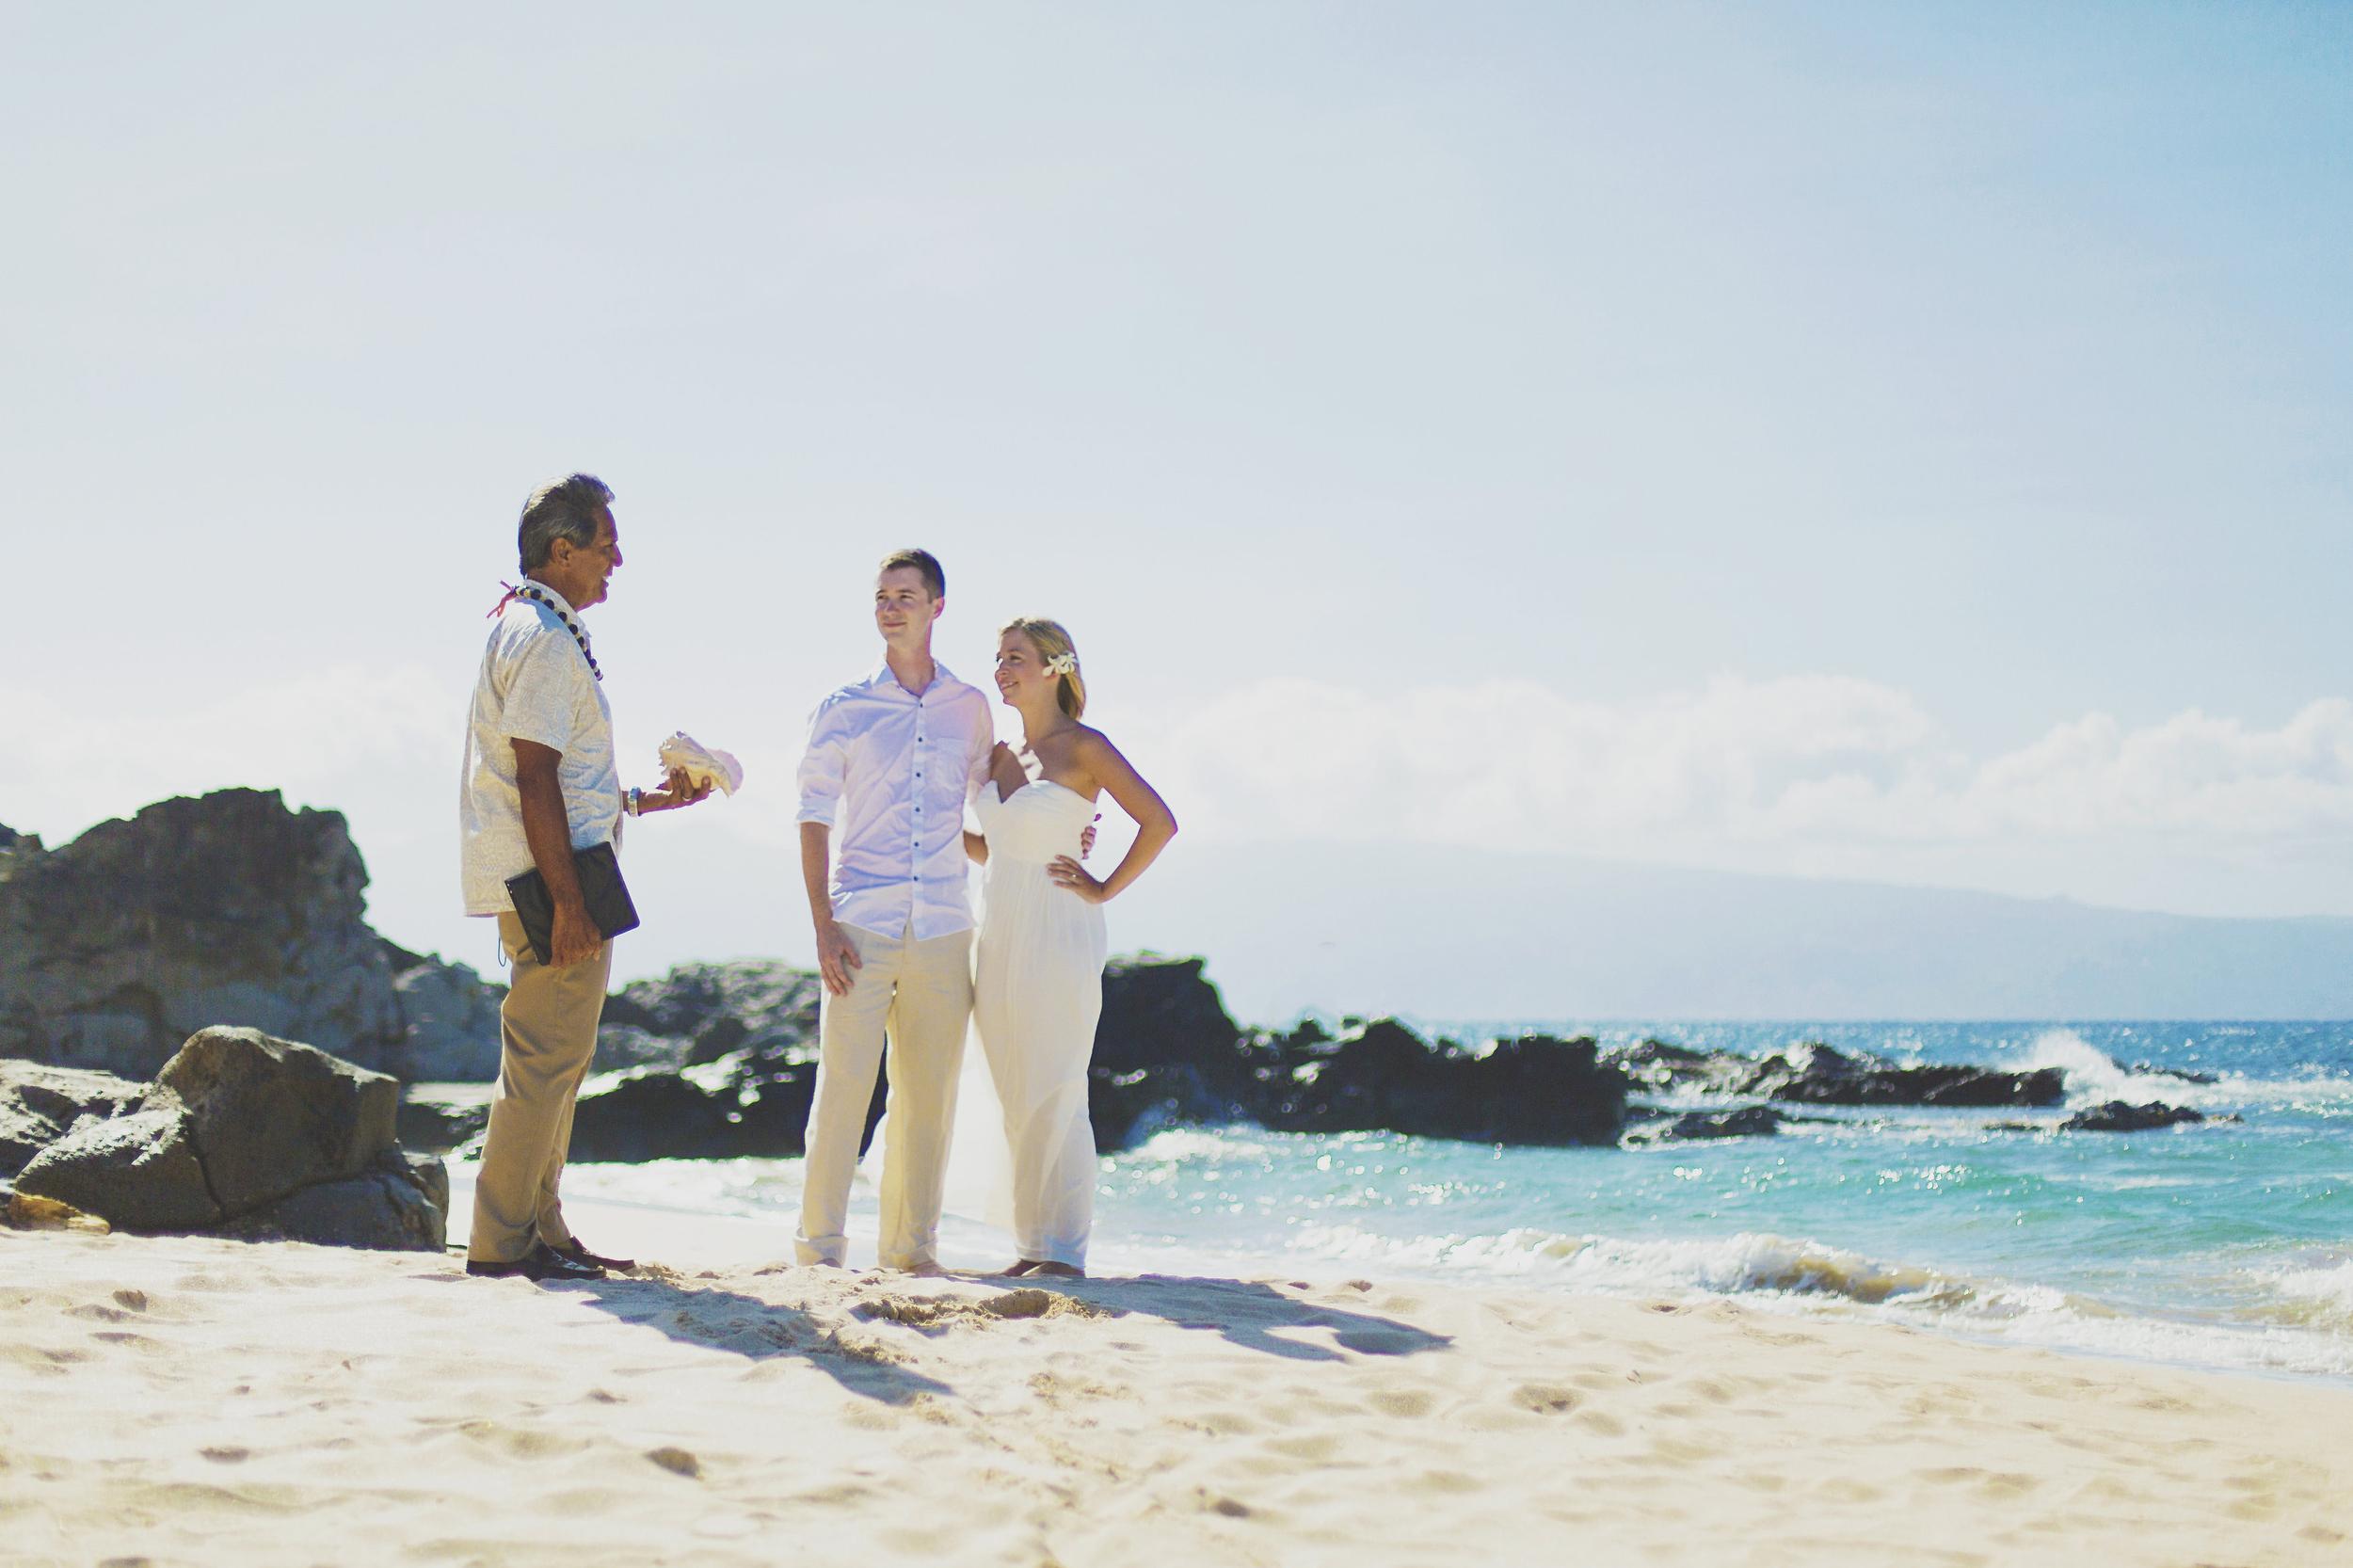 angie-diaz-photography-maui-honeymoon-hawaii-elopement-1.jpg